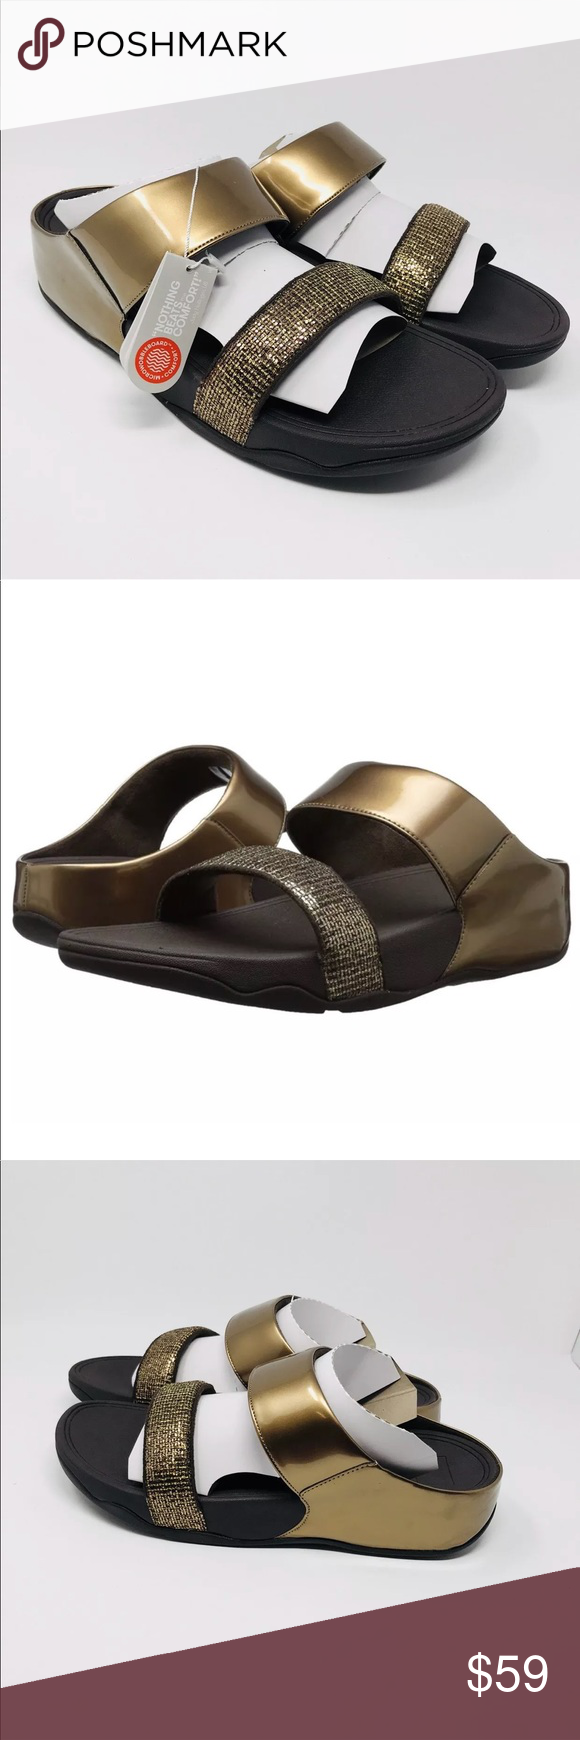 468a8d8b74f0 FitFlop Lulu Superglitz Slide Sandal Bronze 11 M New FitFlop Women s Lulu  Superglitz Slide Dress Sandal